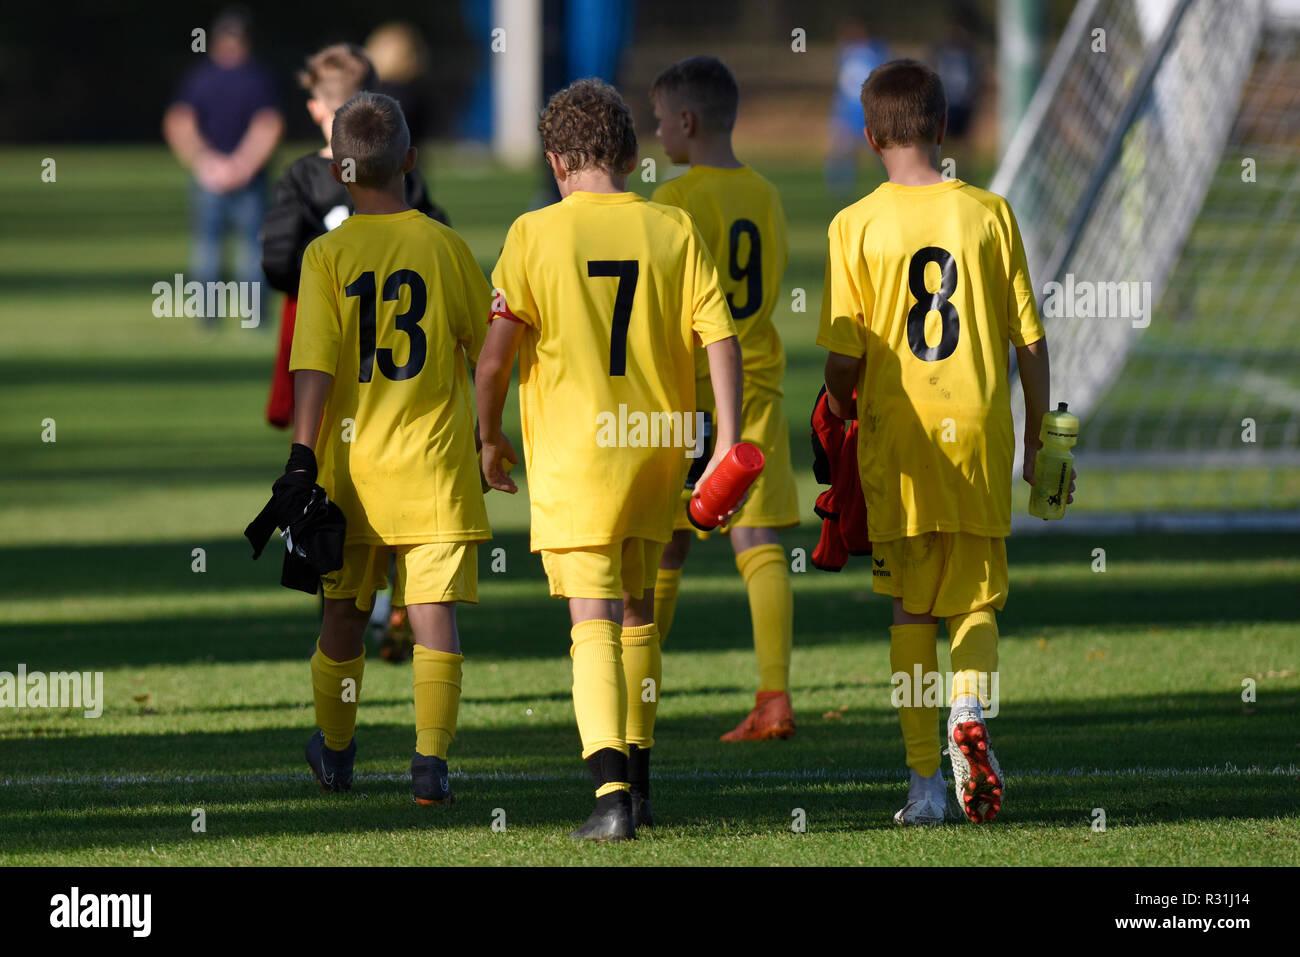 Junior soccer players, U13 juniors, hanging heads, soccer, Basel, Switzerland - Stock Image